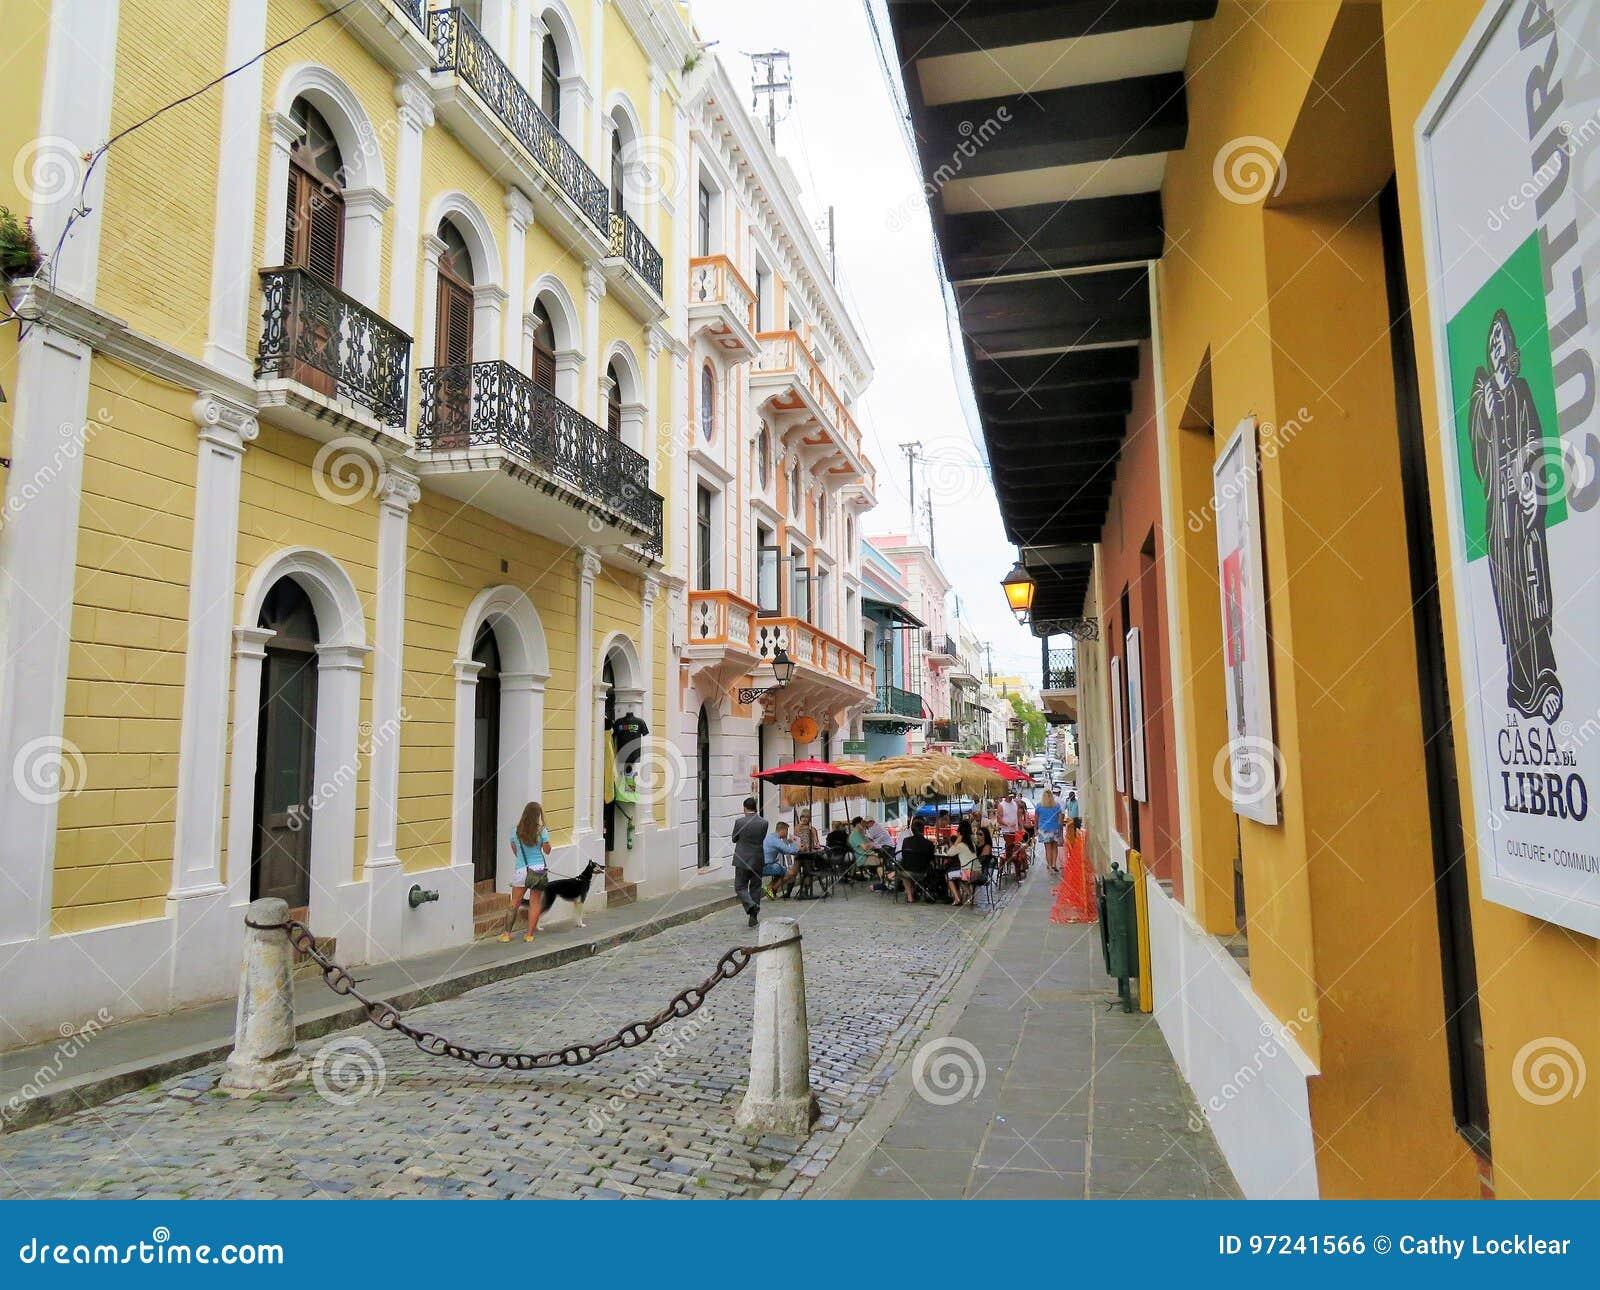 cobblestone streets and architecture in san juan, puerto rico